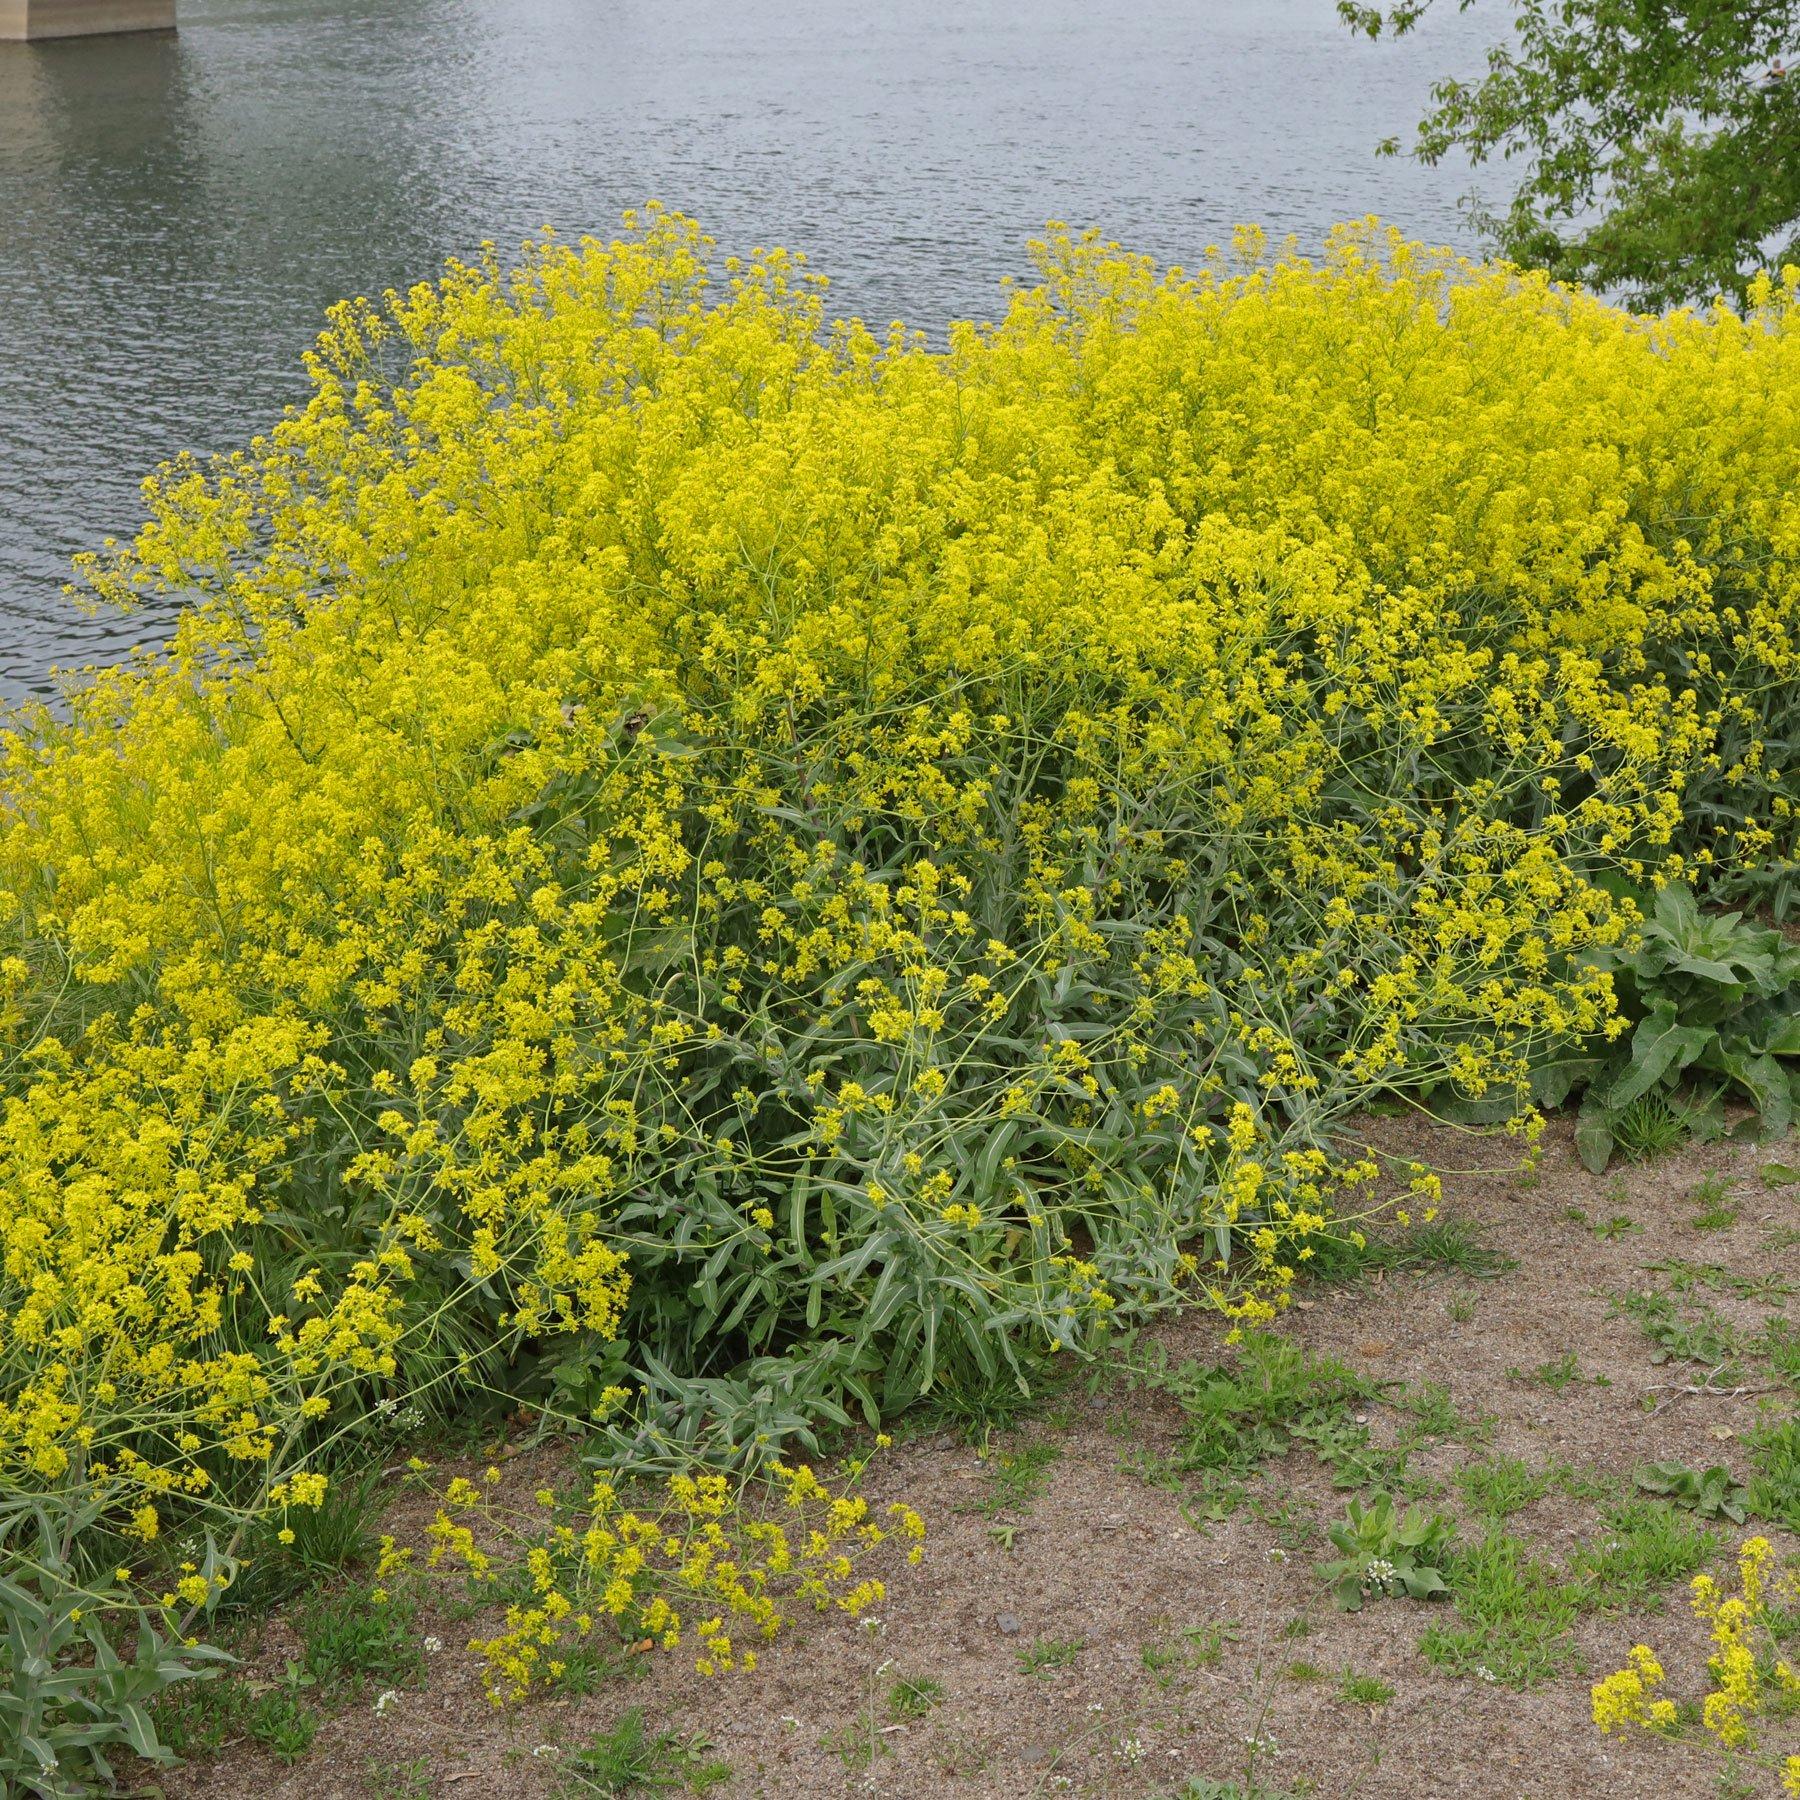 Färber-Waid Ufer